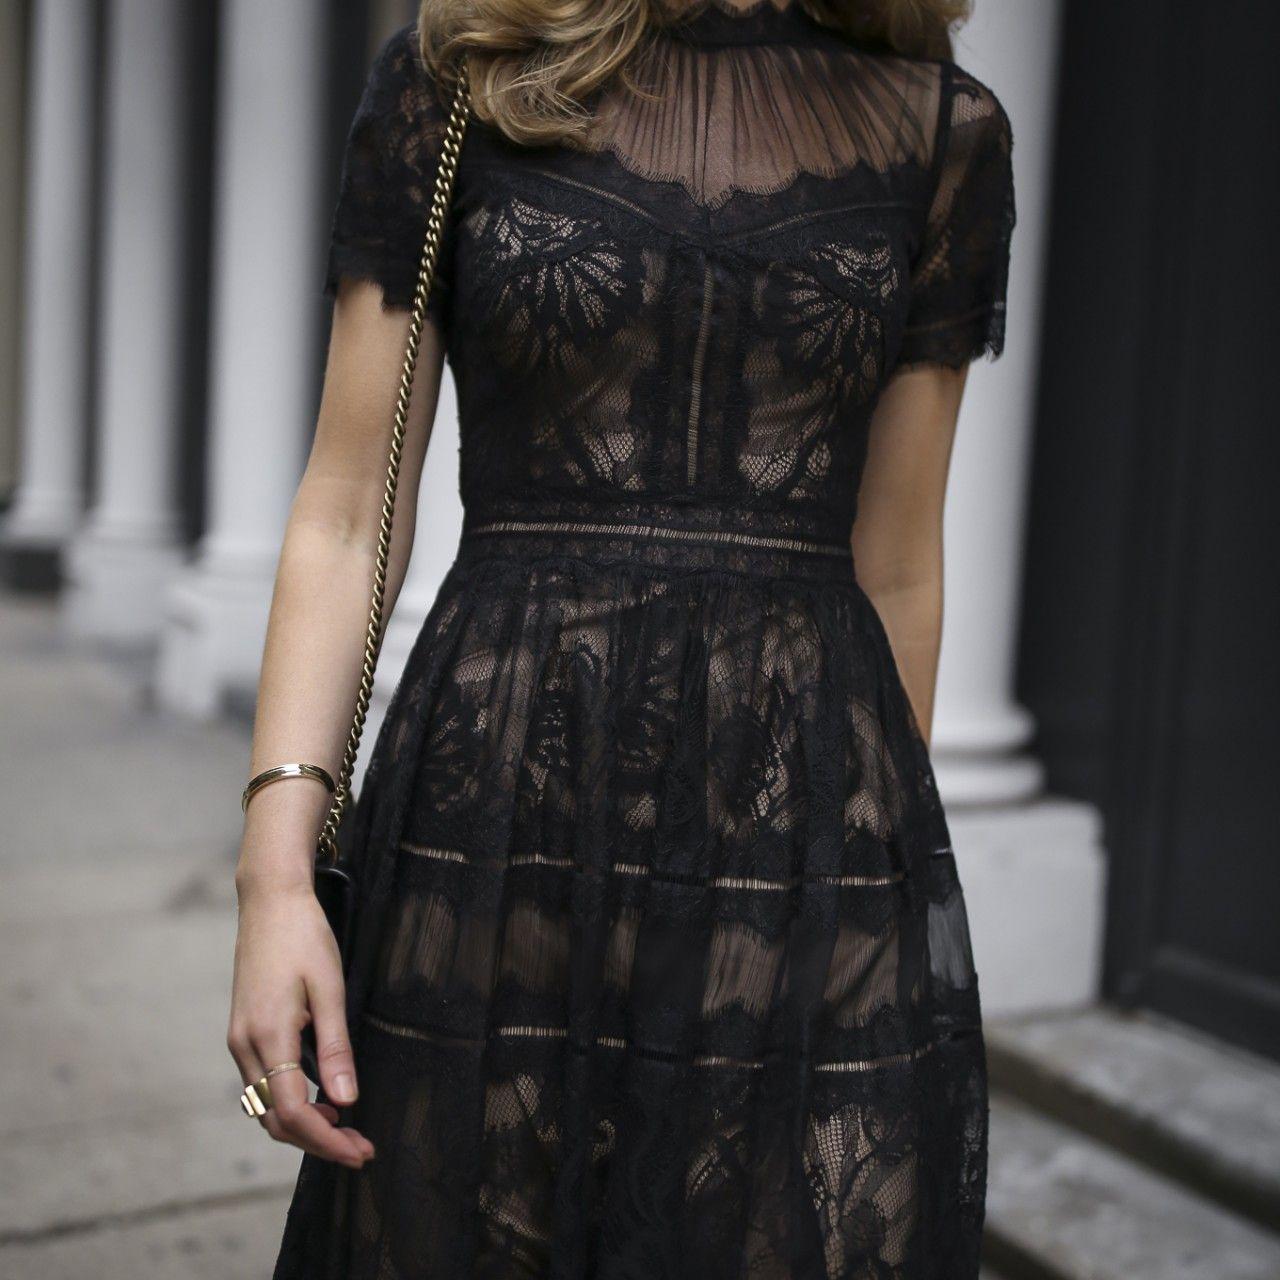 f2d7c38f844 You can t go wrong with a little black dress